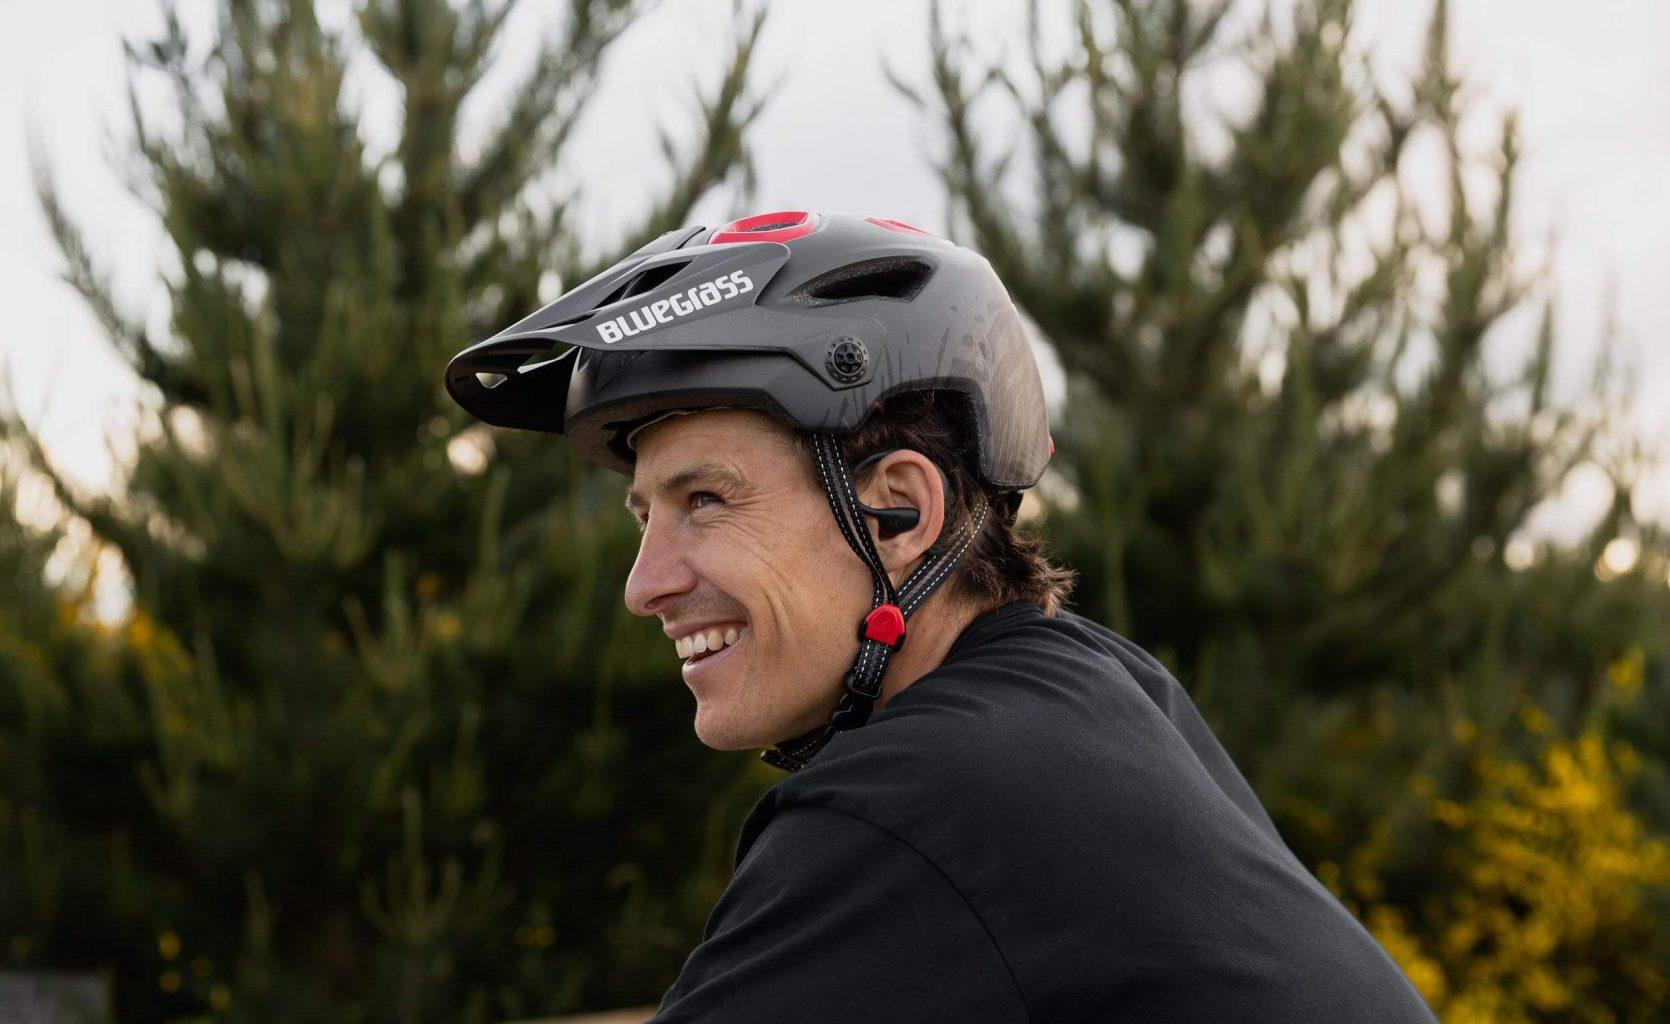 earSHOTS Bluetooth headphones sideview with Helmet and Mountain Biker